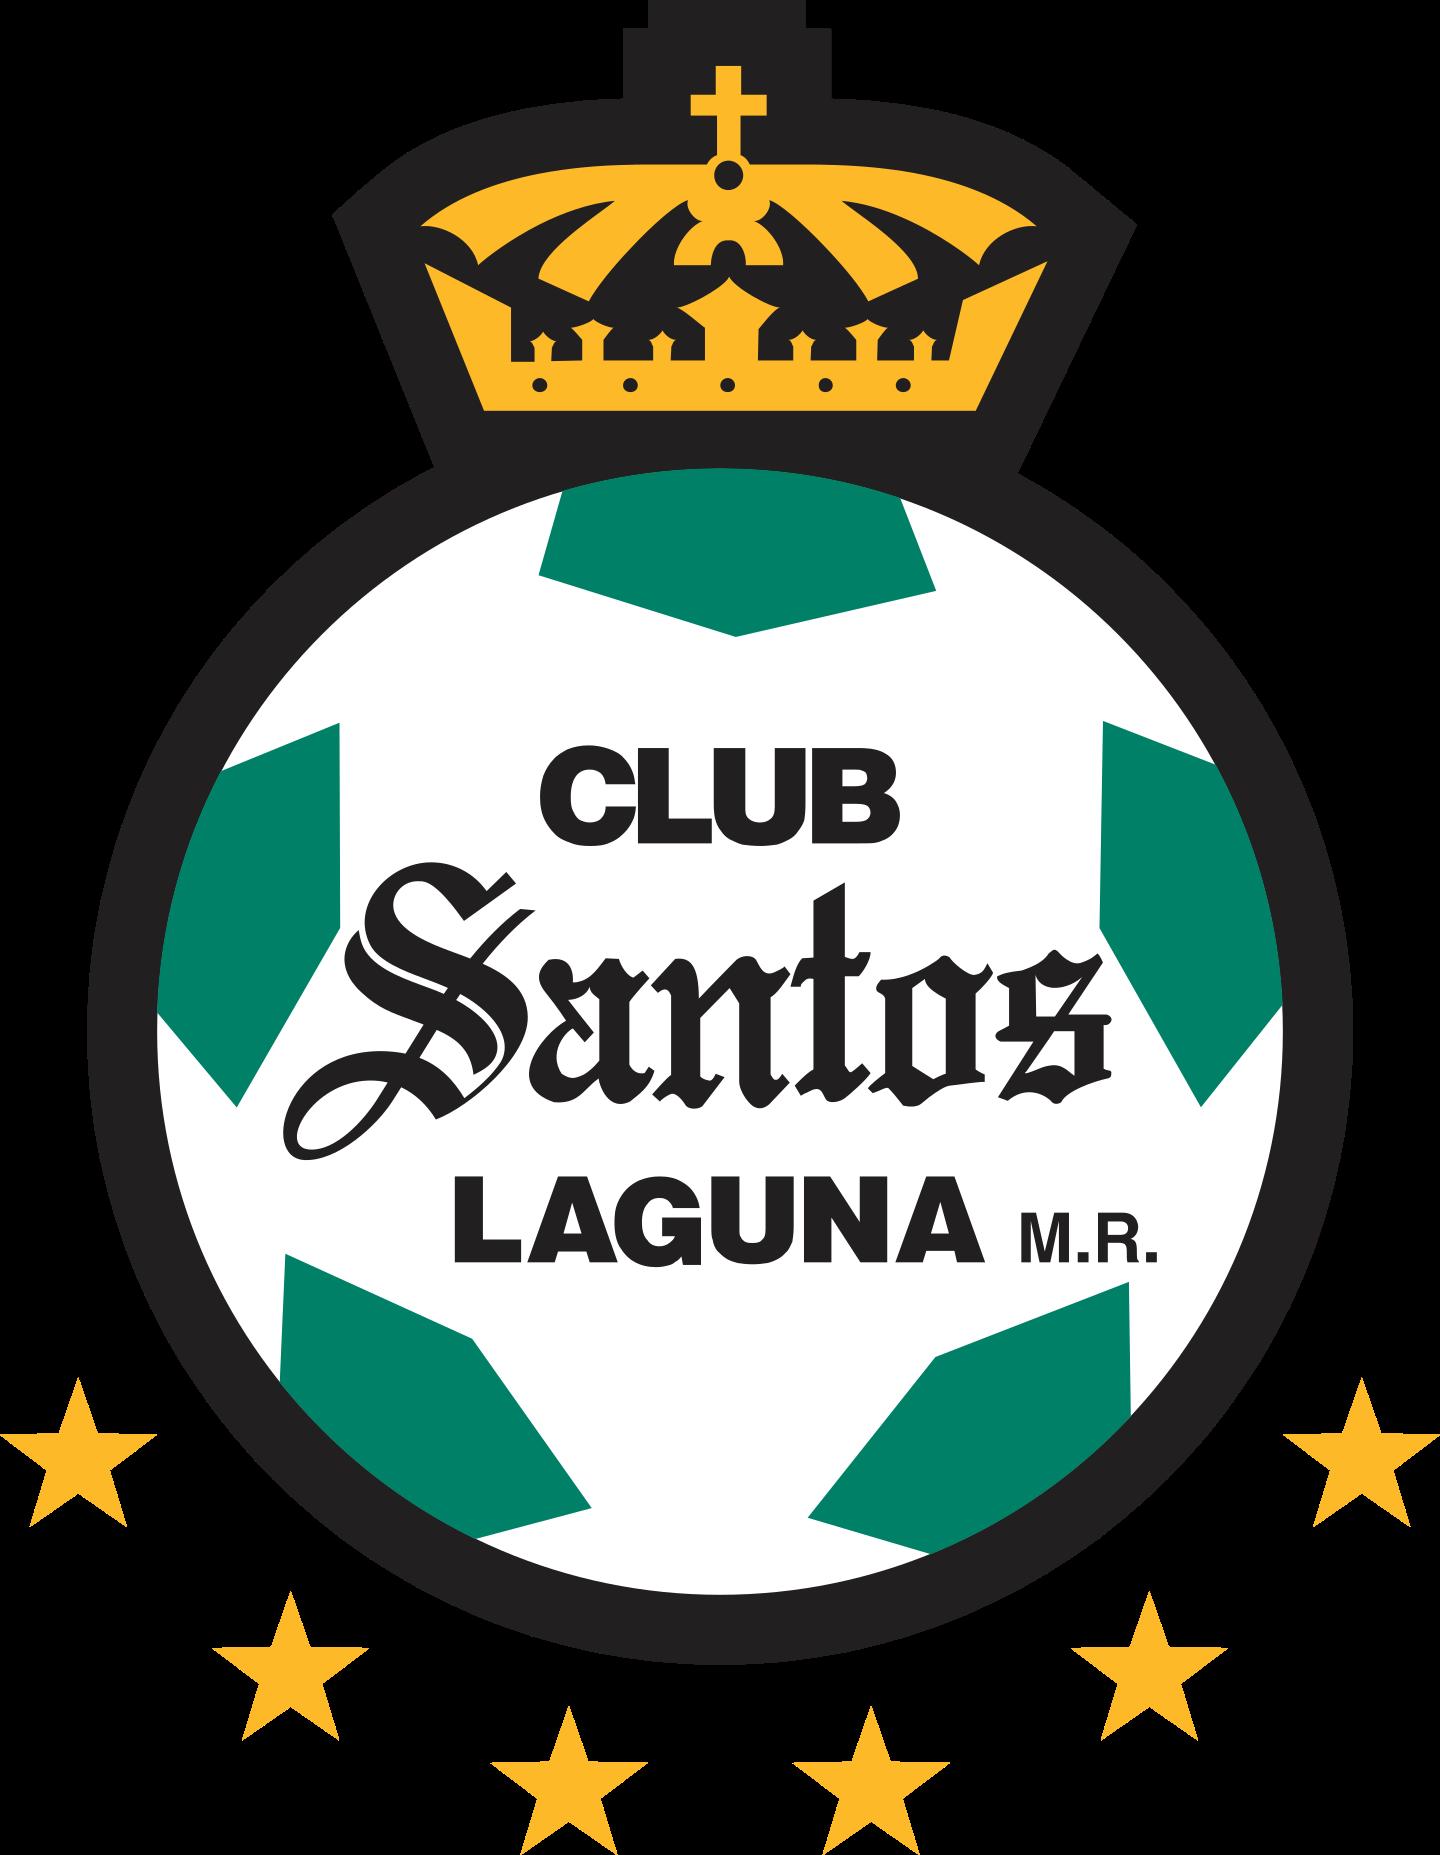 santos laguna logo 2 - Club Santos Laguna Logo - Escudo